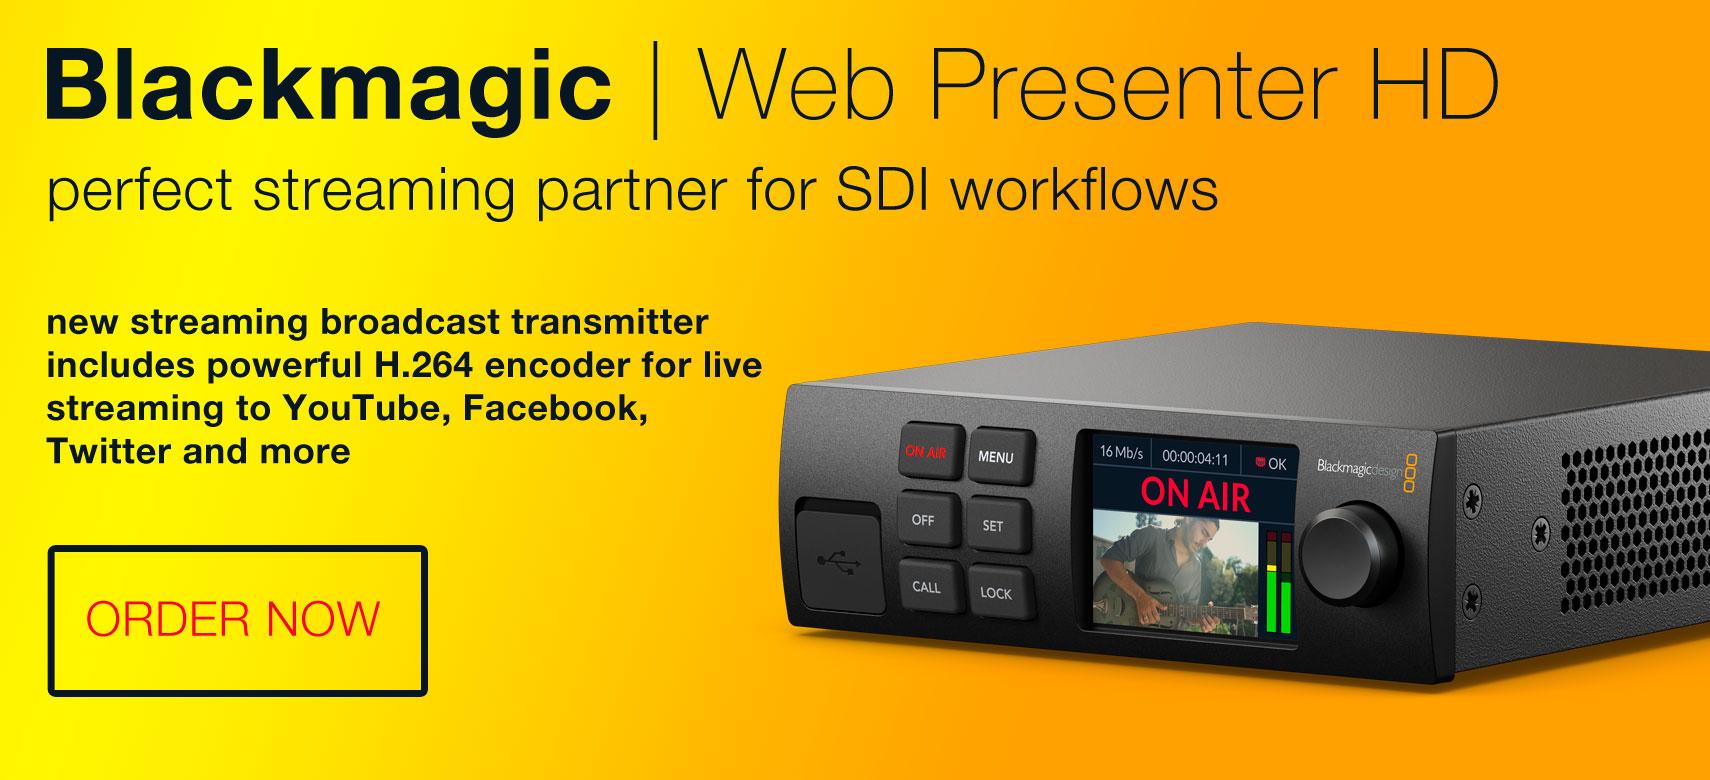 BMD Web Presenter HD